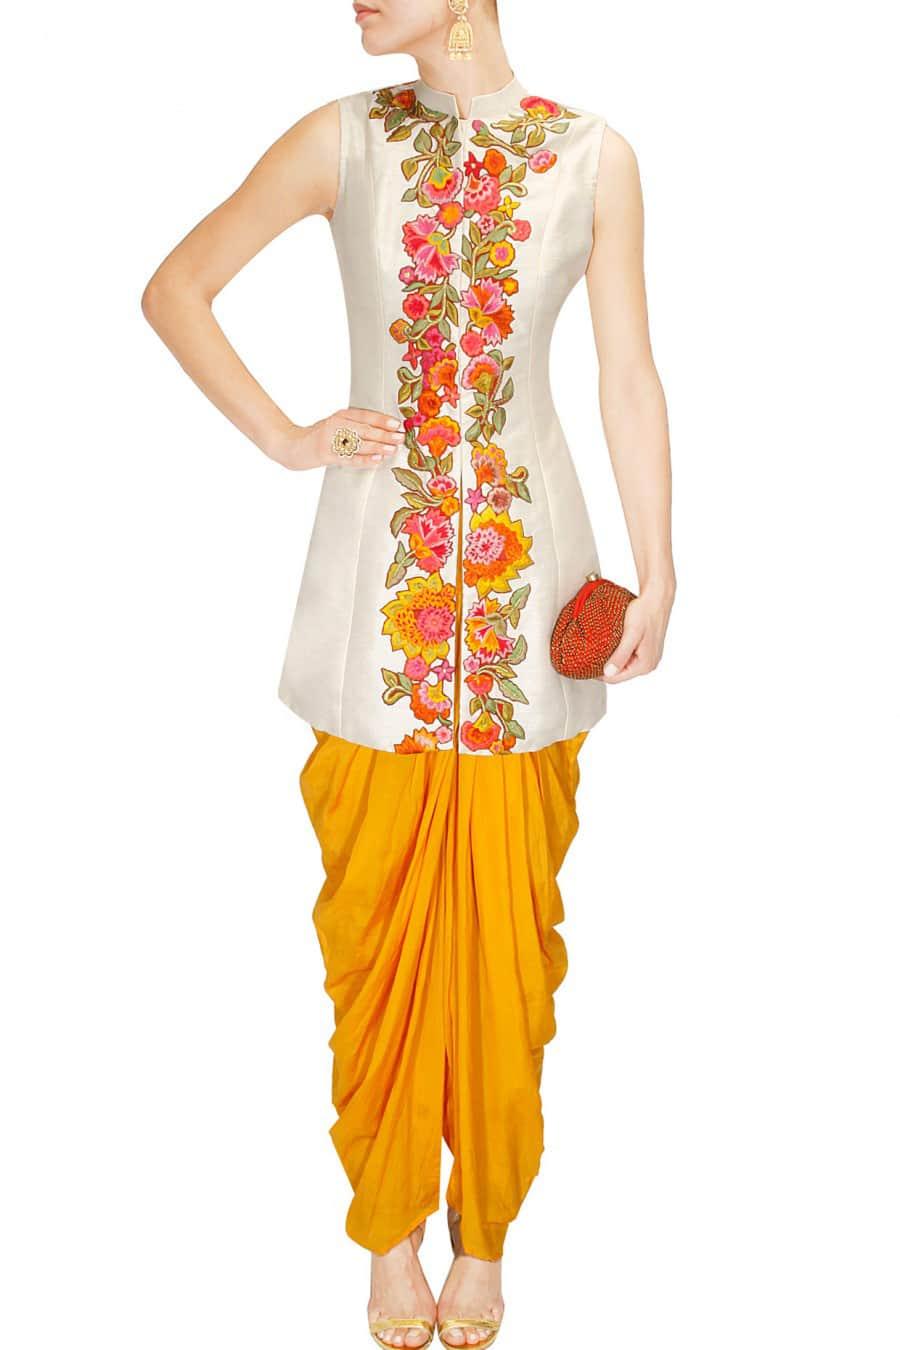 Aharin Online Ethnic Designer Wear Shopping Boutique For Womens Wear